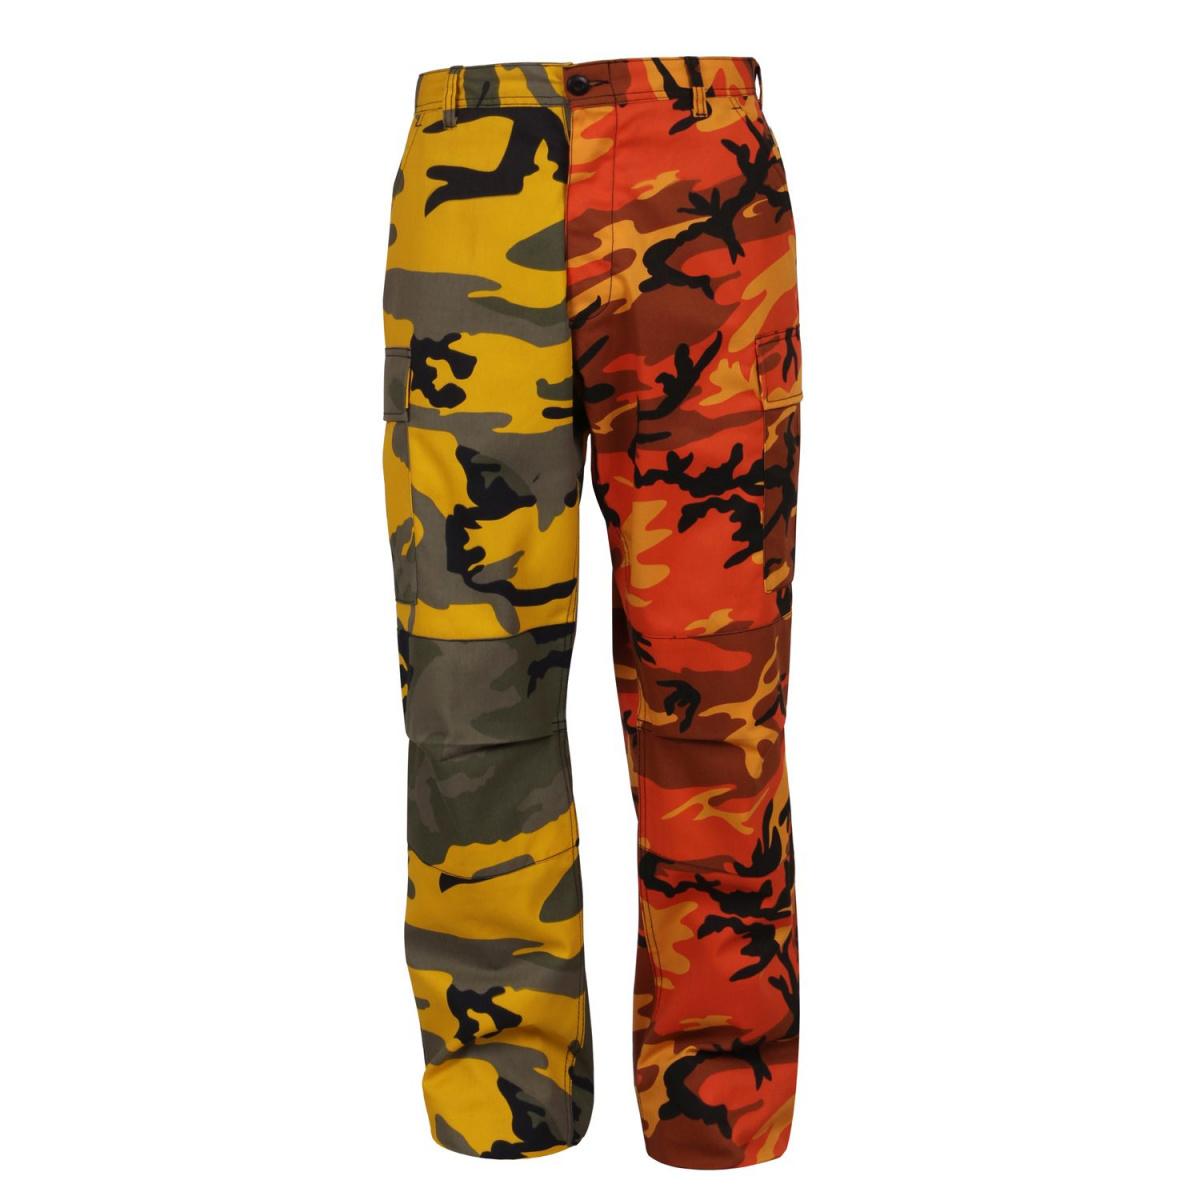 dd61cbbe570 Kalhoty dvoubarevné BDU YELLOW ORANGE CAMO - ROTHCO - Army shop ...